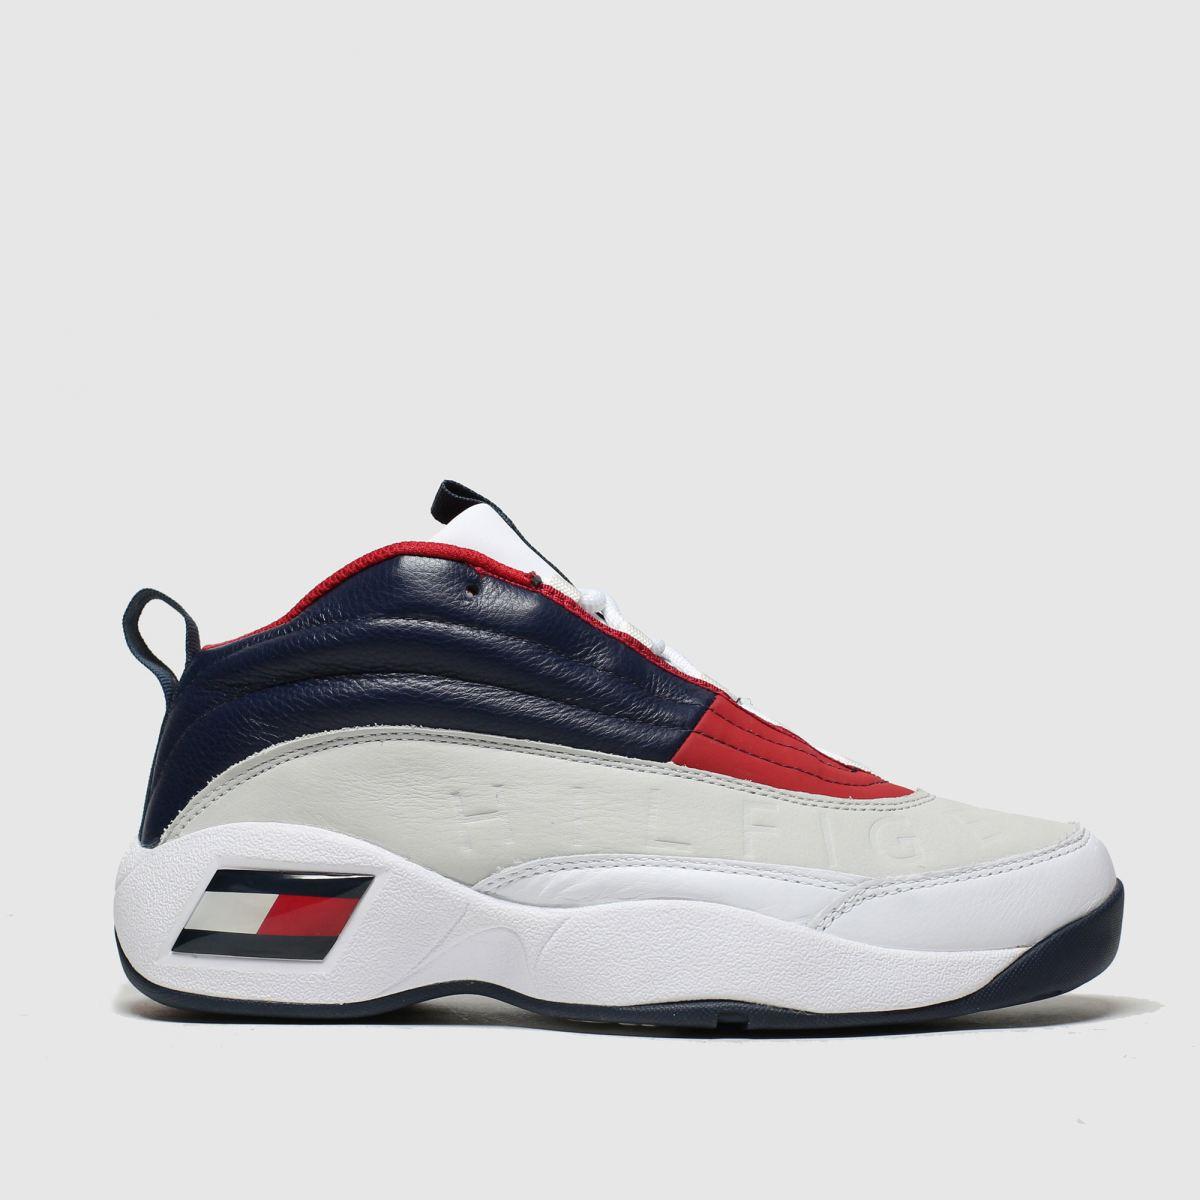 Tommy Hilfiger White & Navy Tj The Skew Heritage Sneaker Trainer